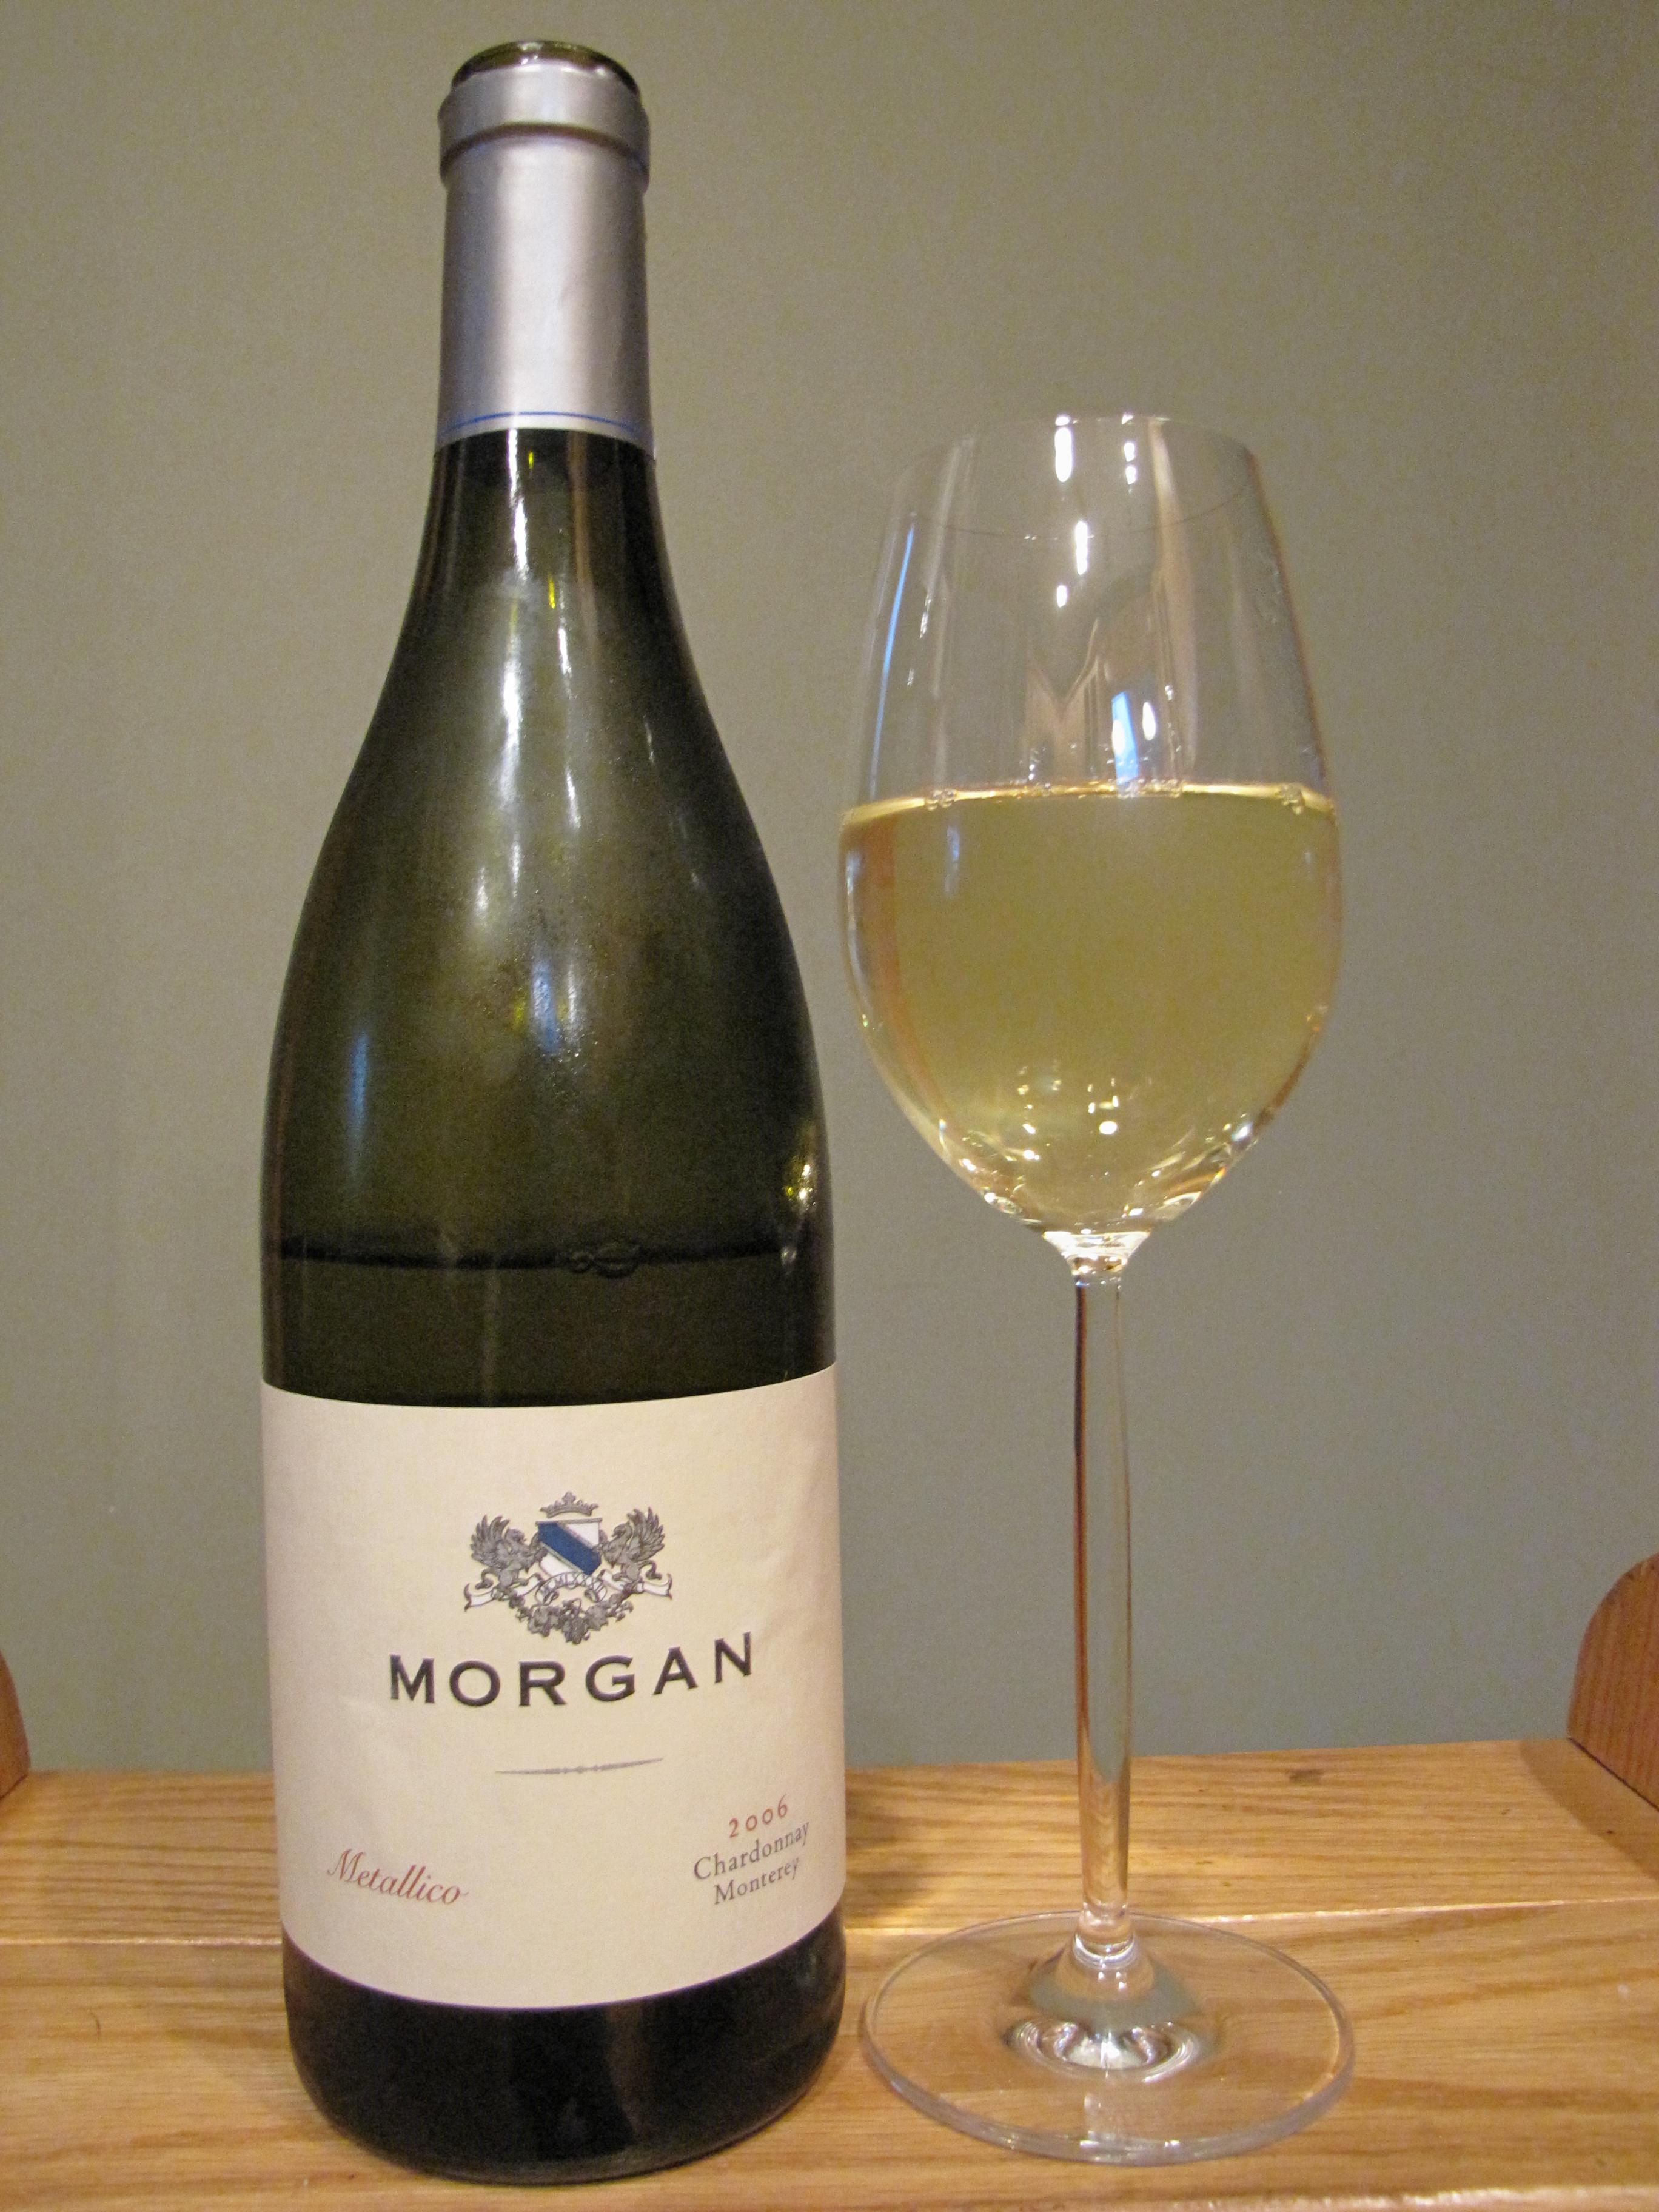 Morgan Chardonnay Metallico (2006)